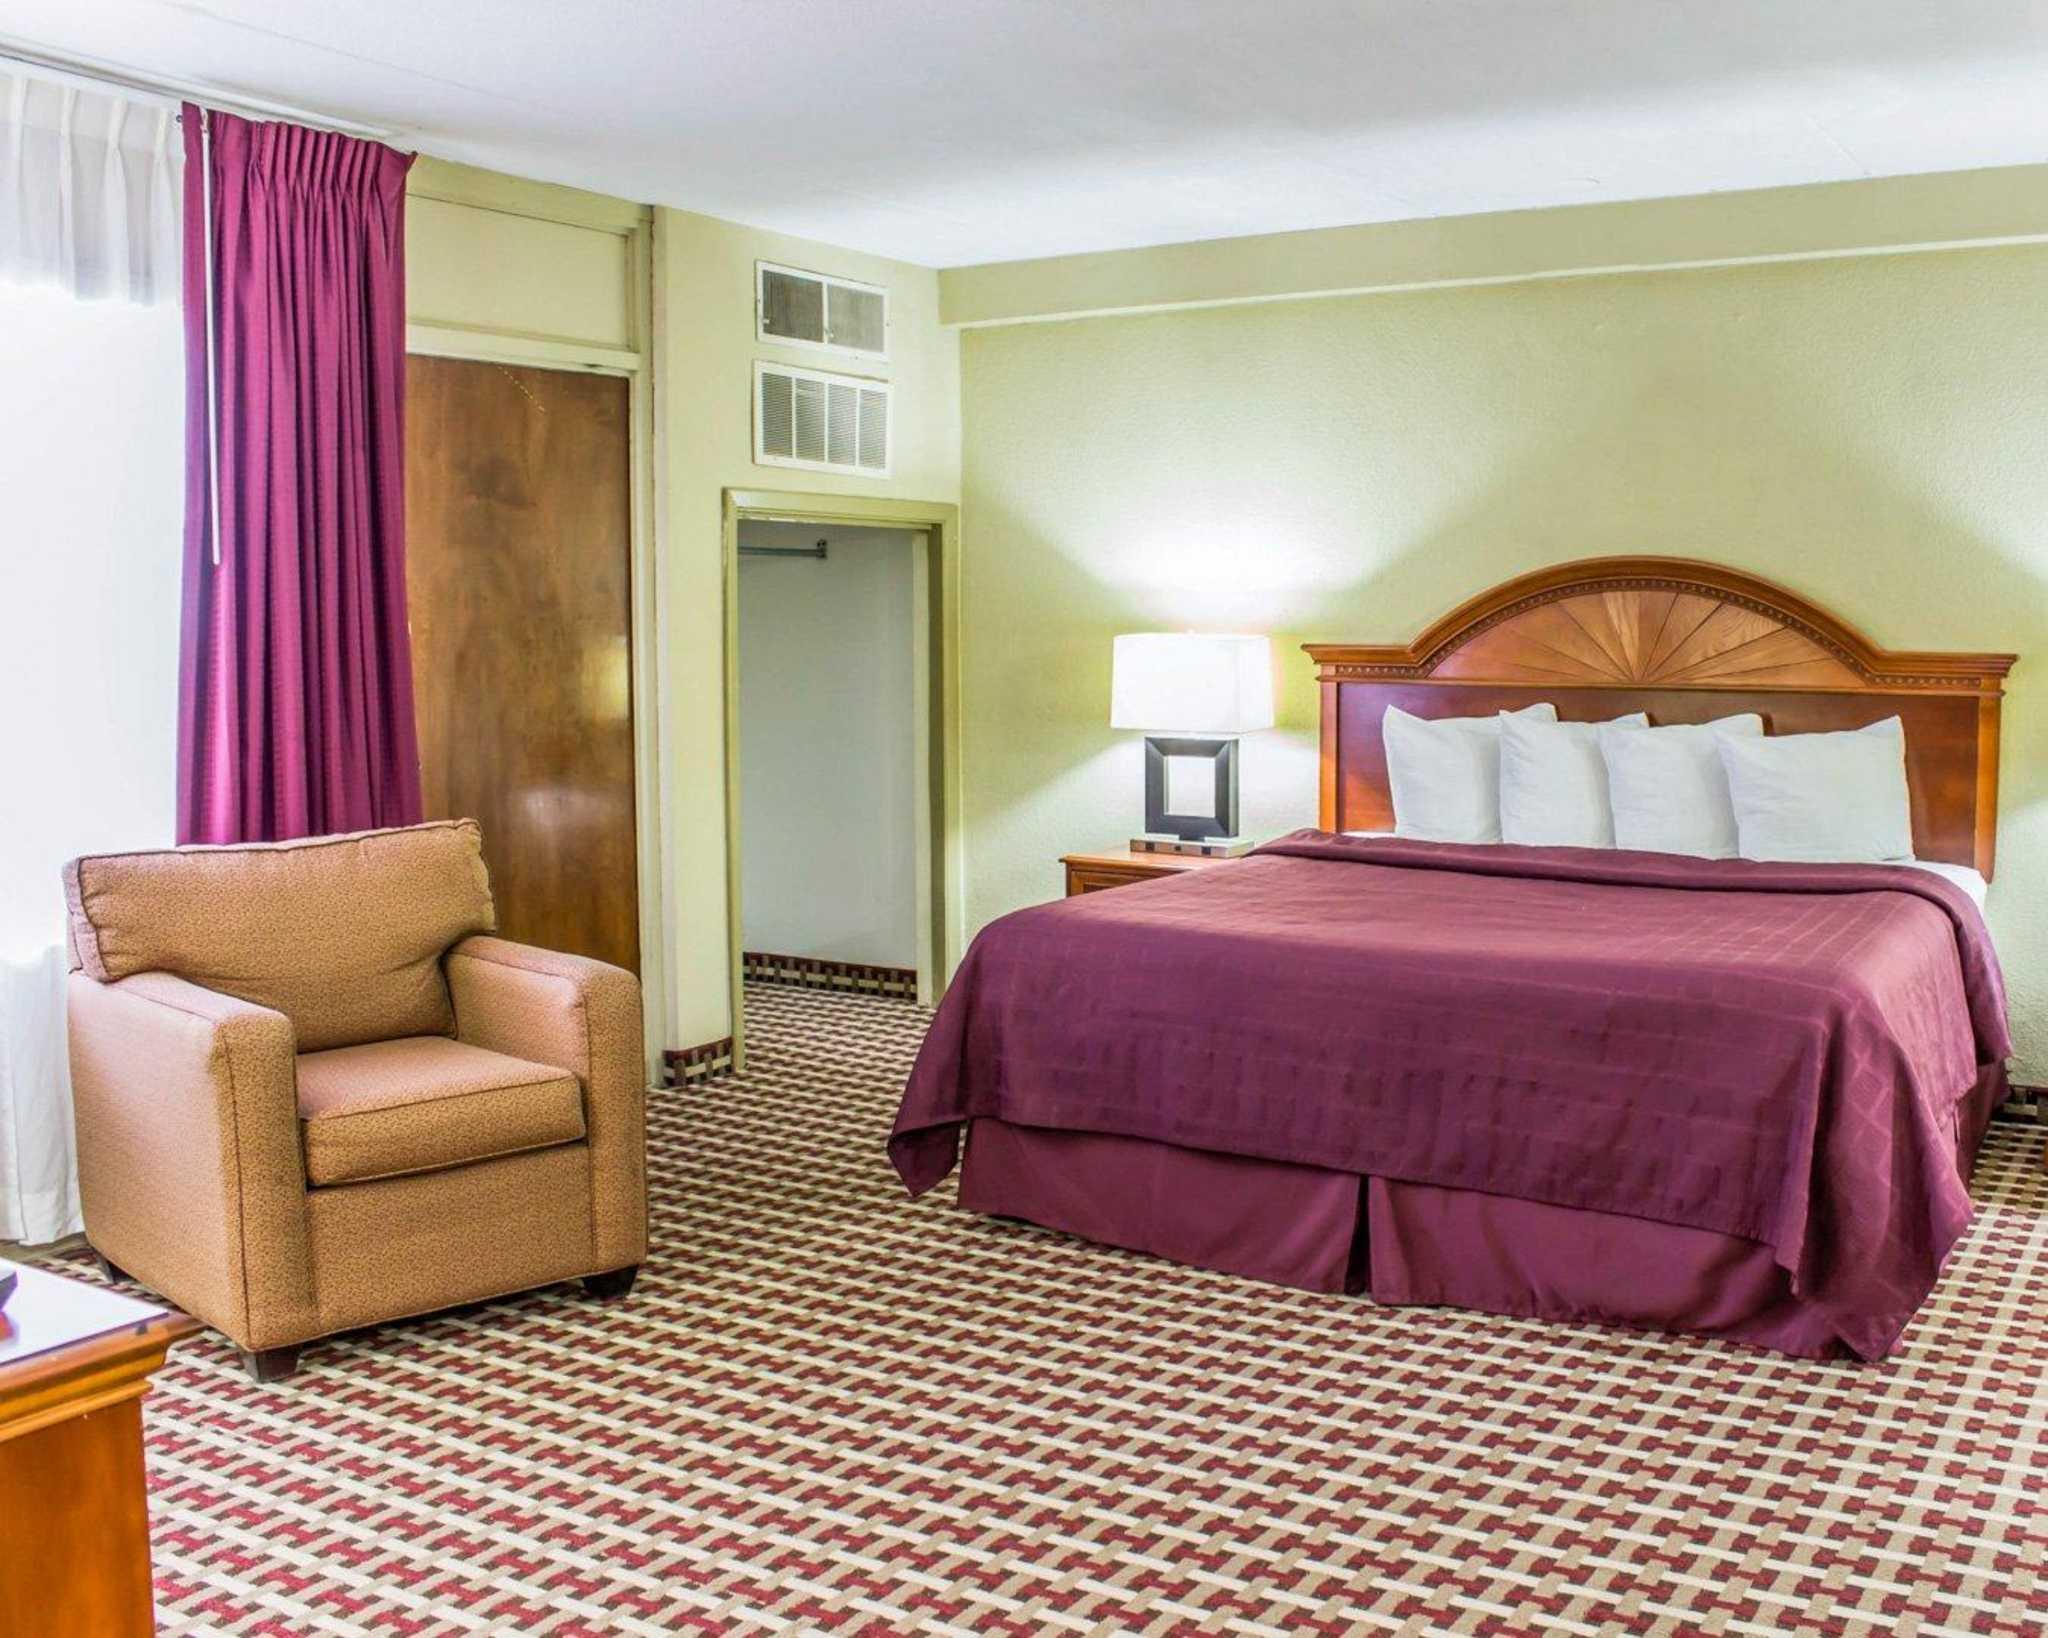 Quality Inn & Suites Fort Bragg image 19